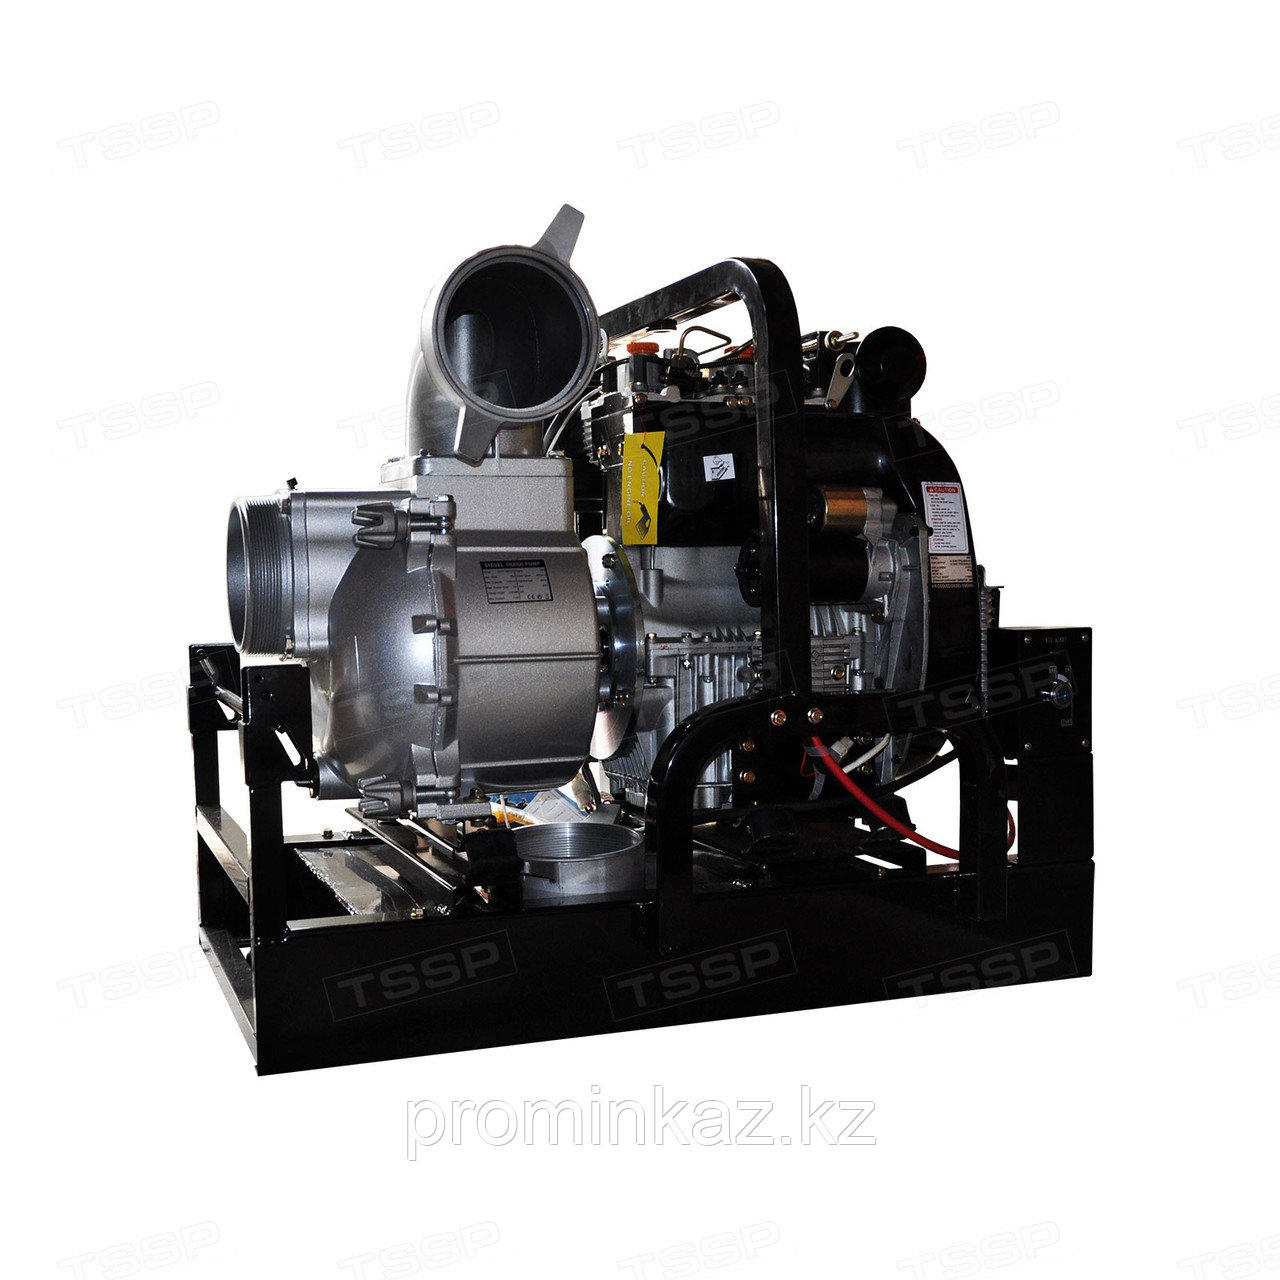 Мотопомпа дизельная ALTECO WP150,  130куб.м/час, 150мм для грязной воды